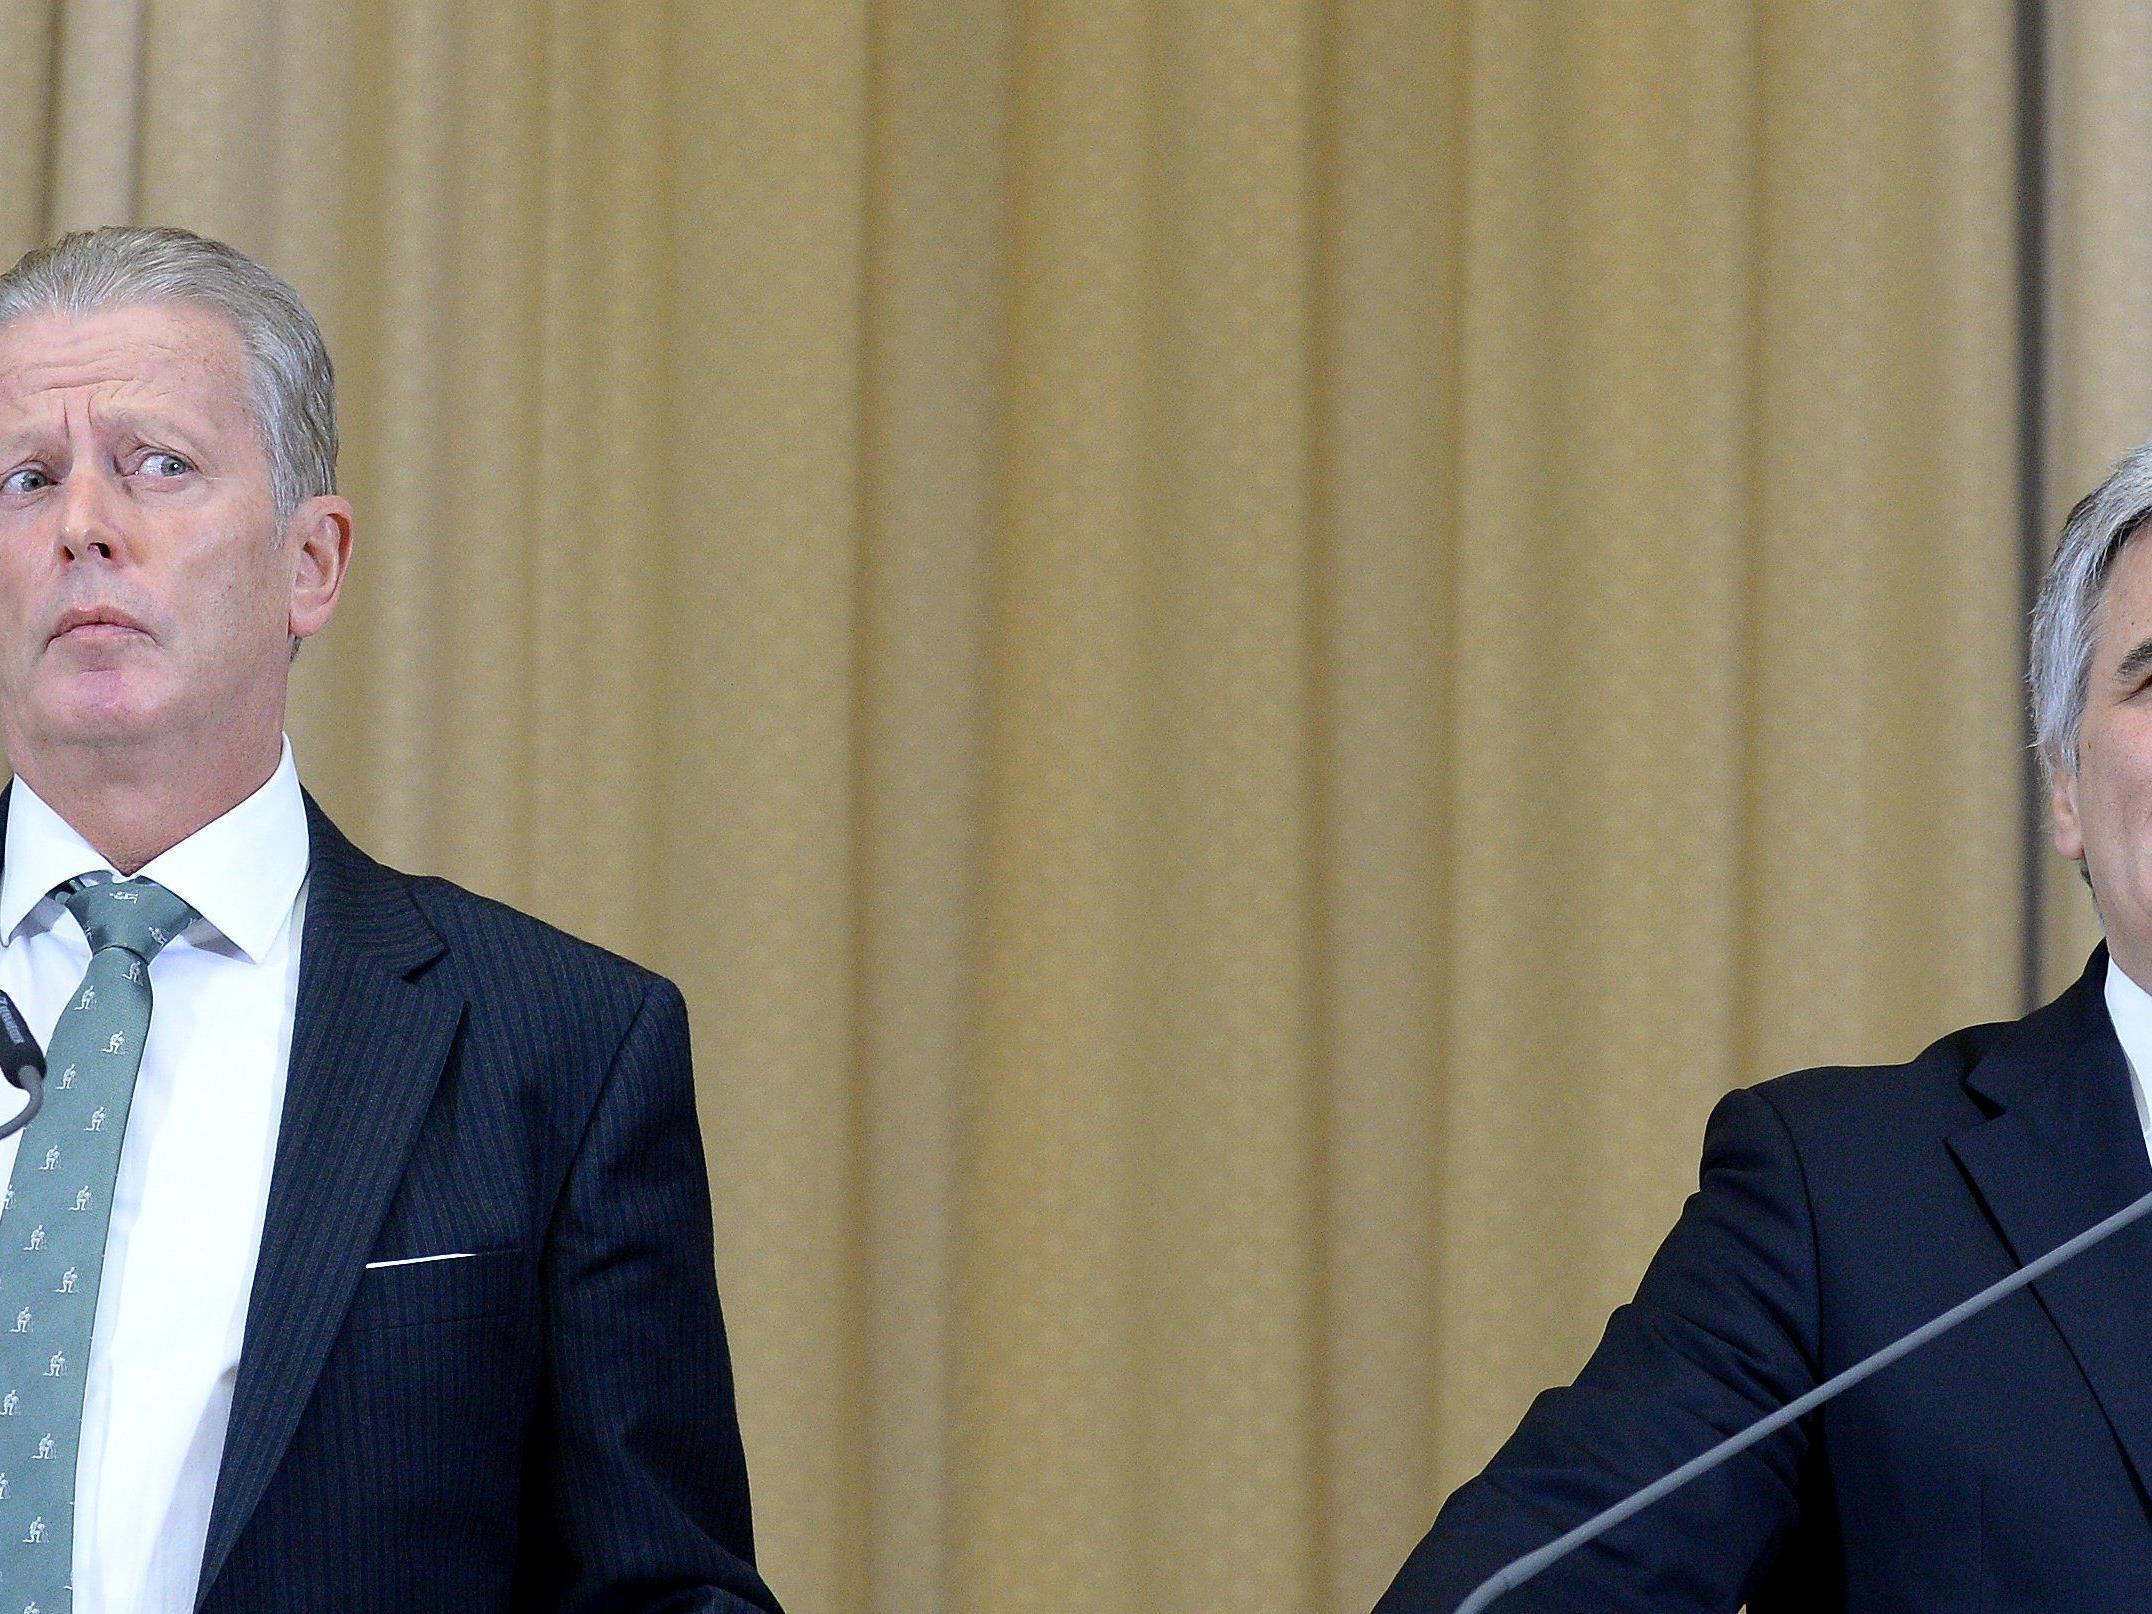 Beschluss zu TTIP: Faymann soll ÖVP via Medien über Pläne informiert haben.